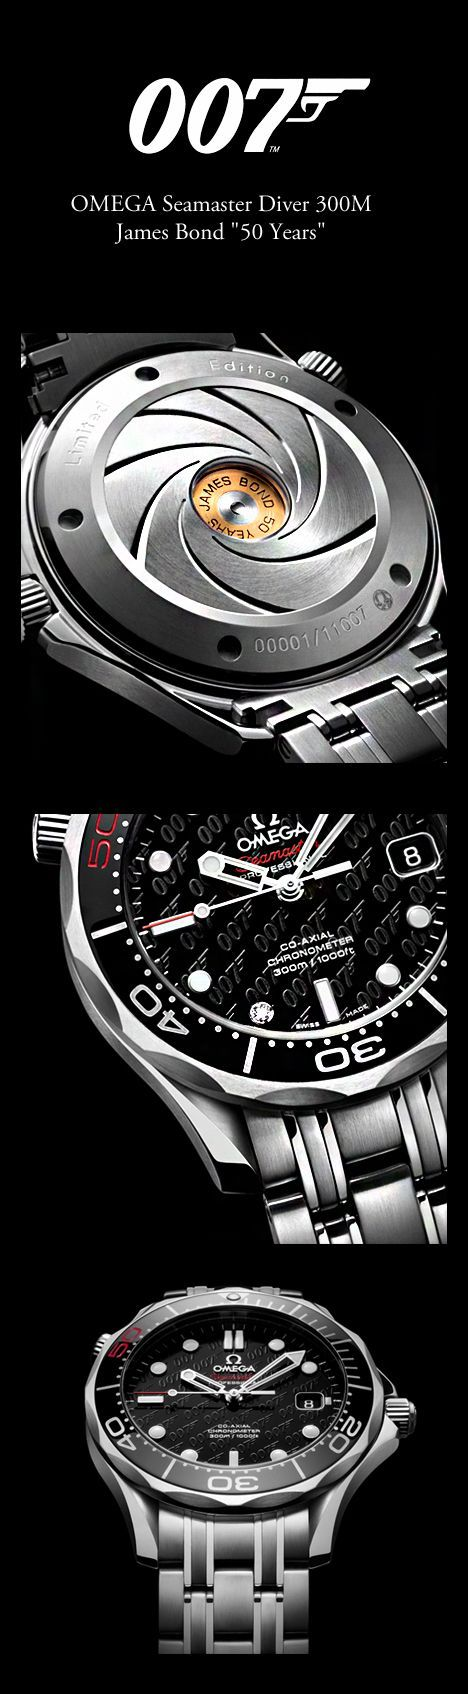 "http://rubies.work/0607-emerald-rings/ OMEGA Seamaster Diver 300M James Bond ""50 Years"""